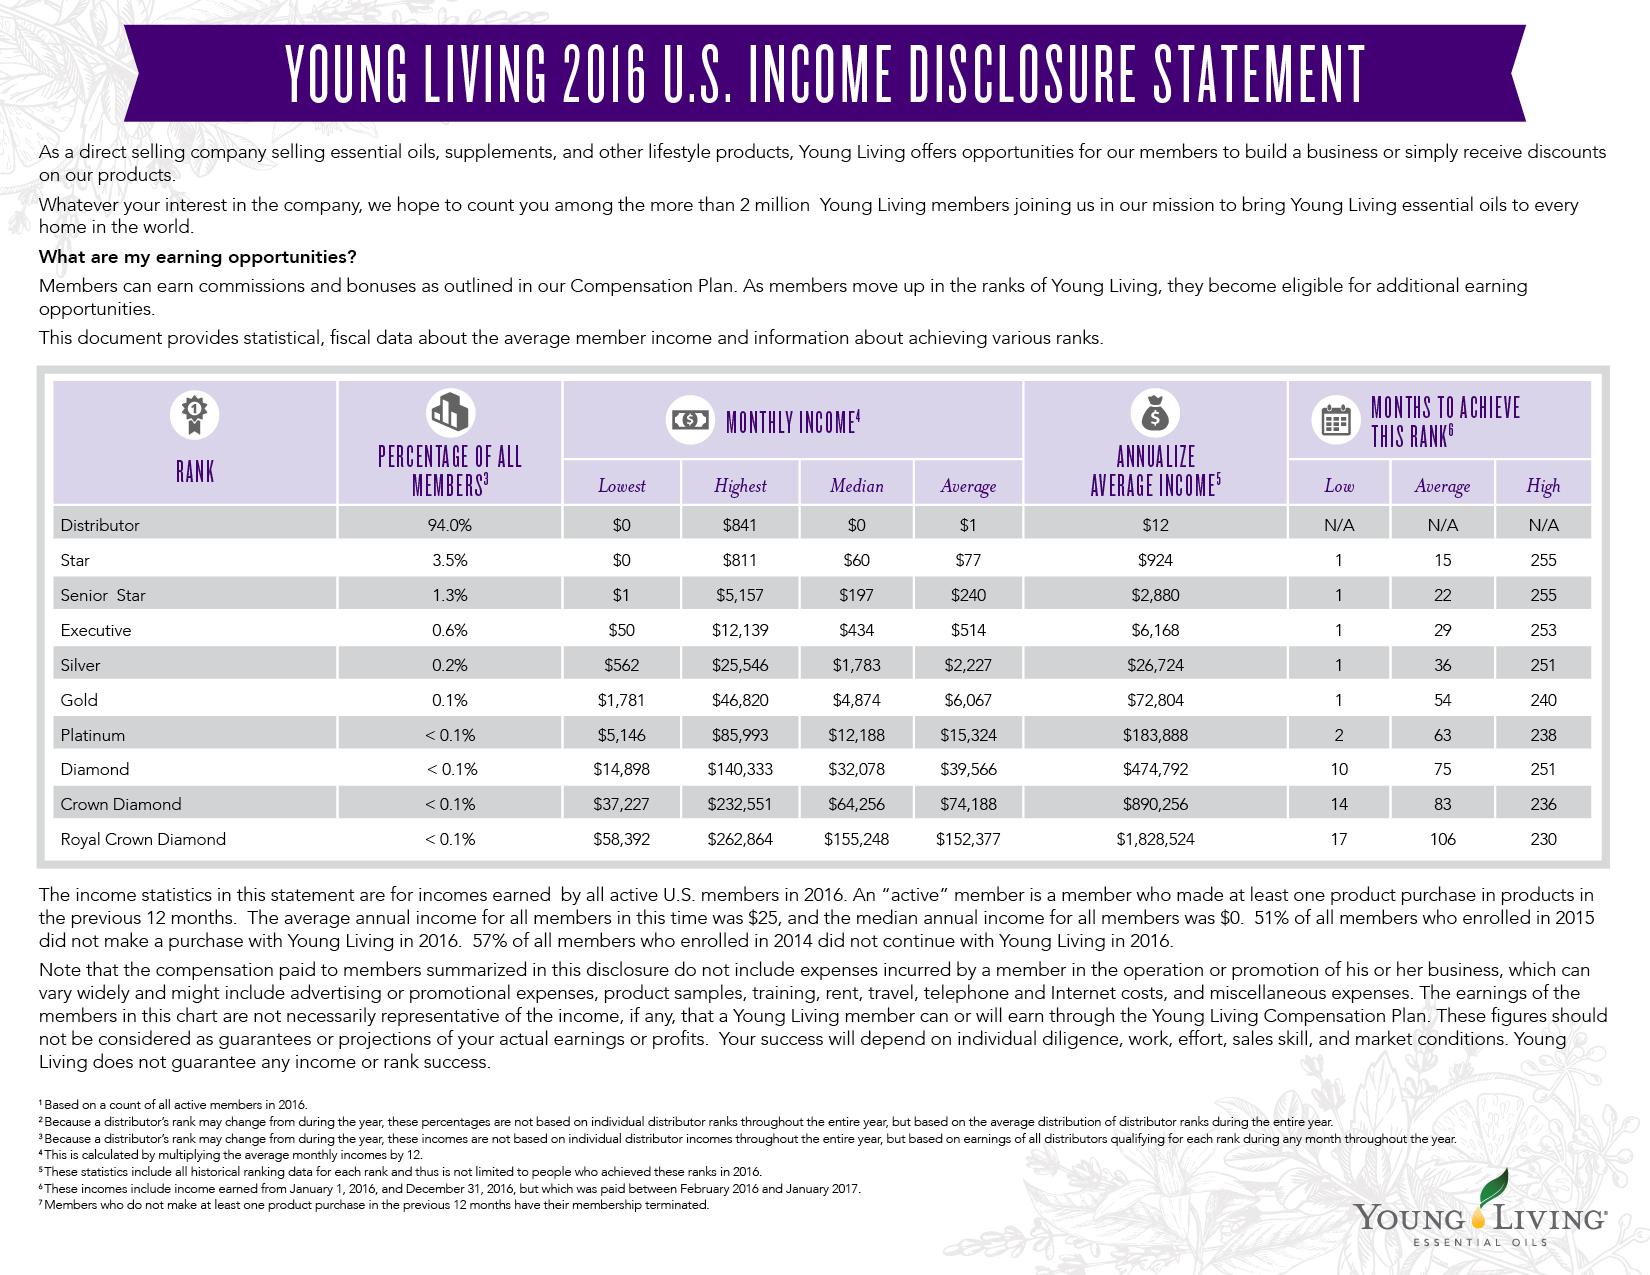 incomedisclosurestatement_image_us2016.jpg